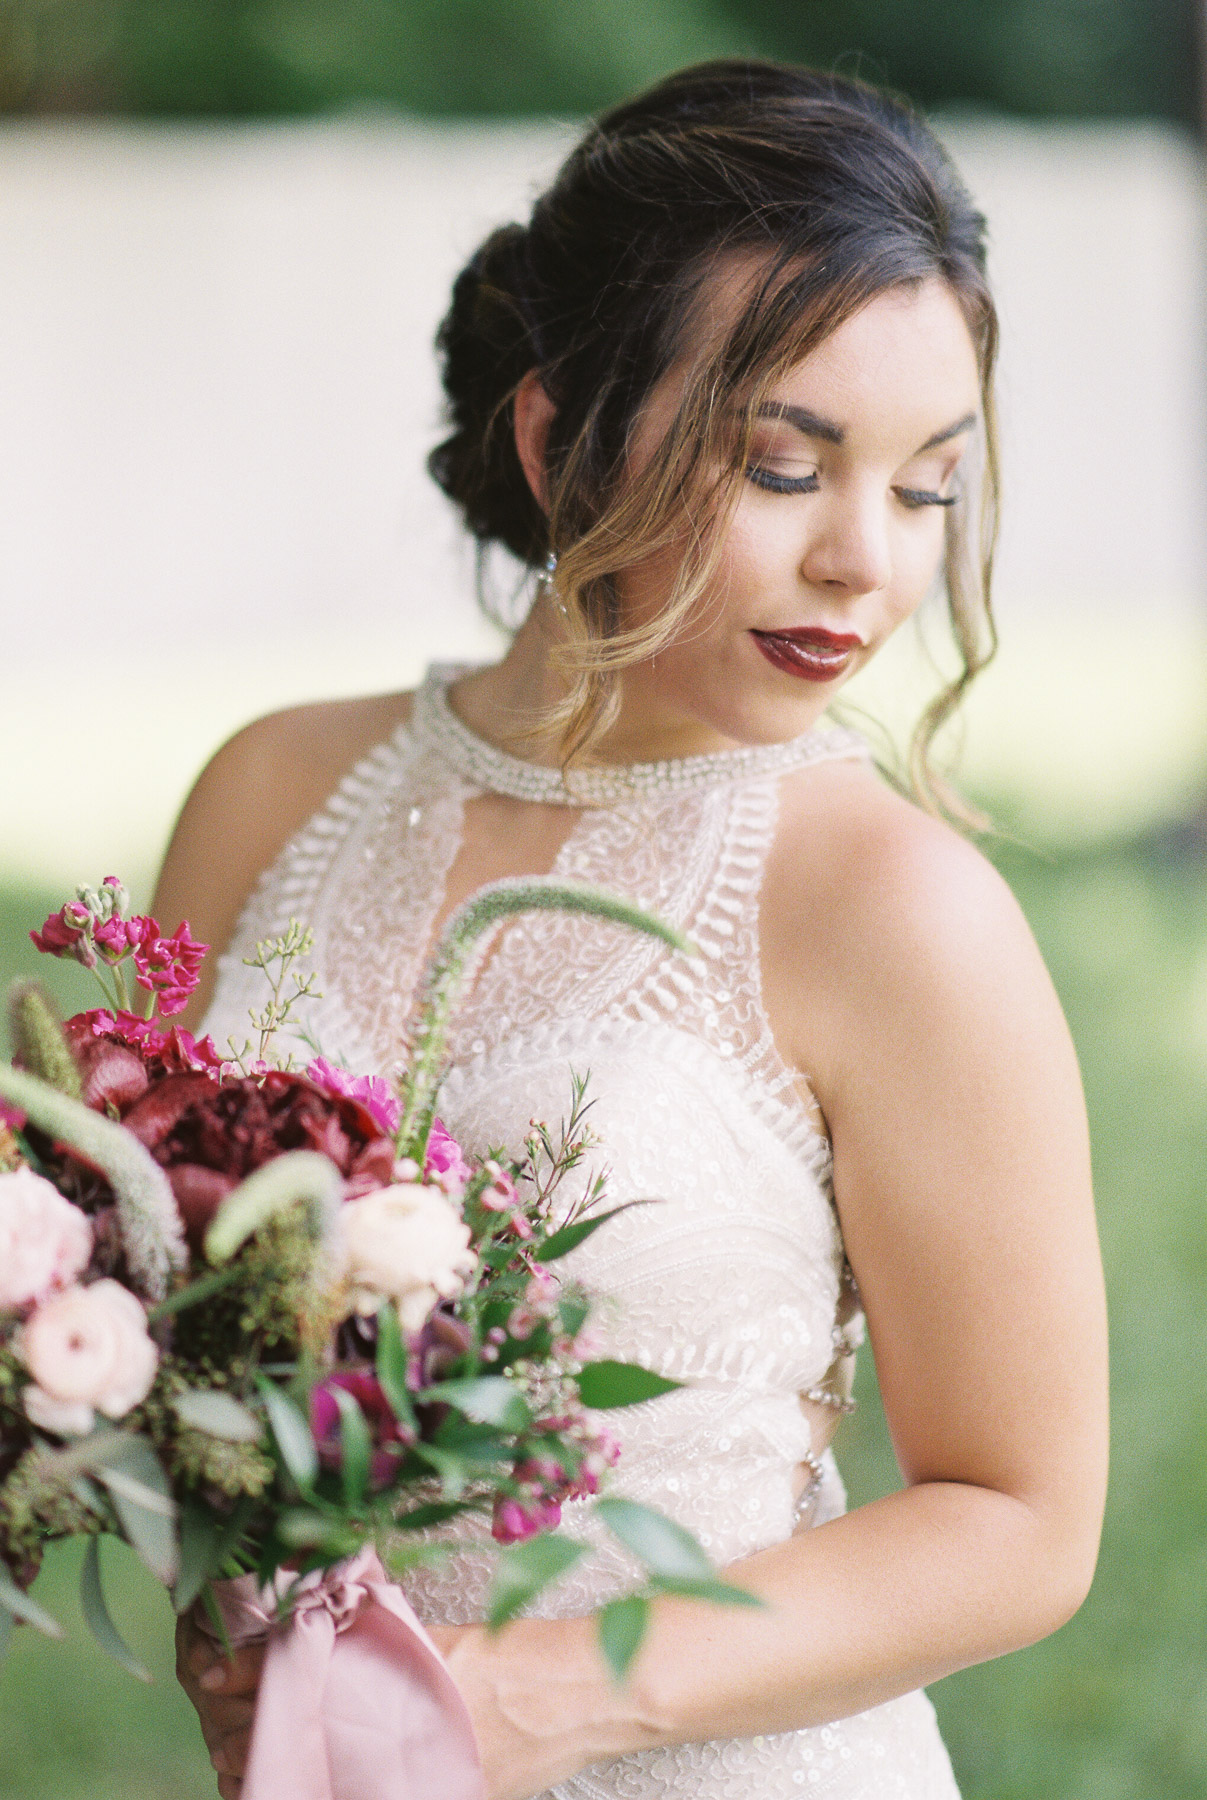 KateTaramykinStudios-Portfolio-Weddings-LuxmoreGrande-3.jpg